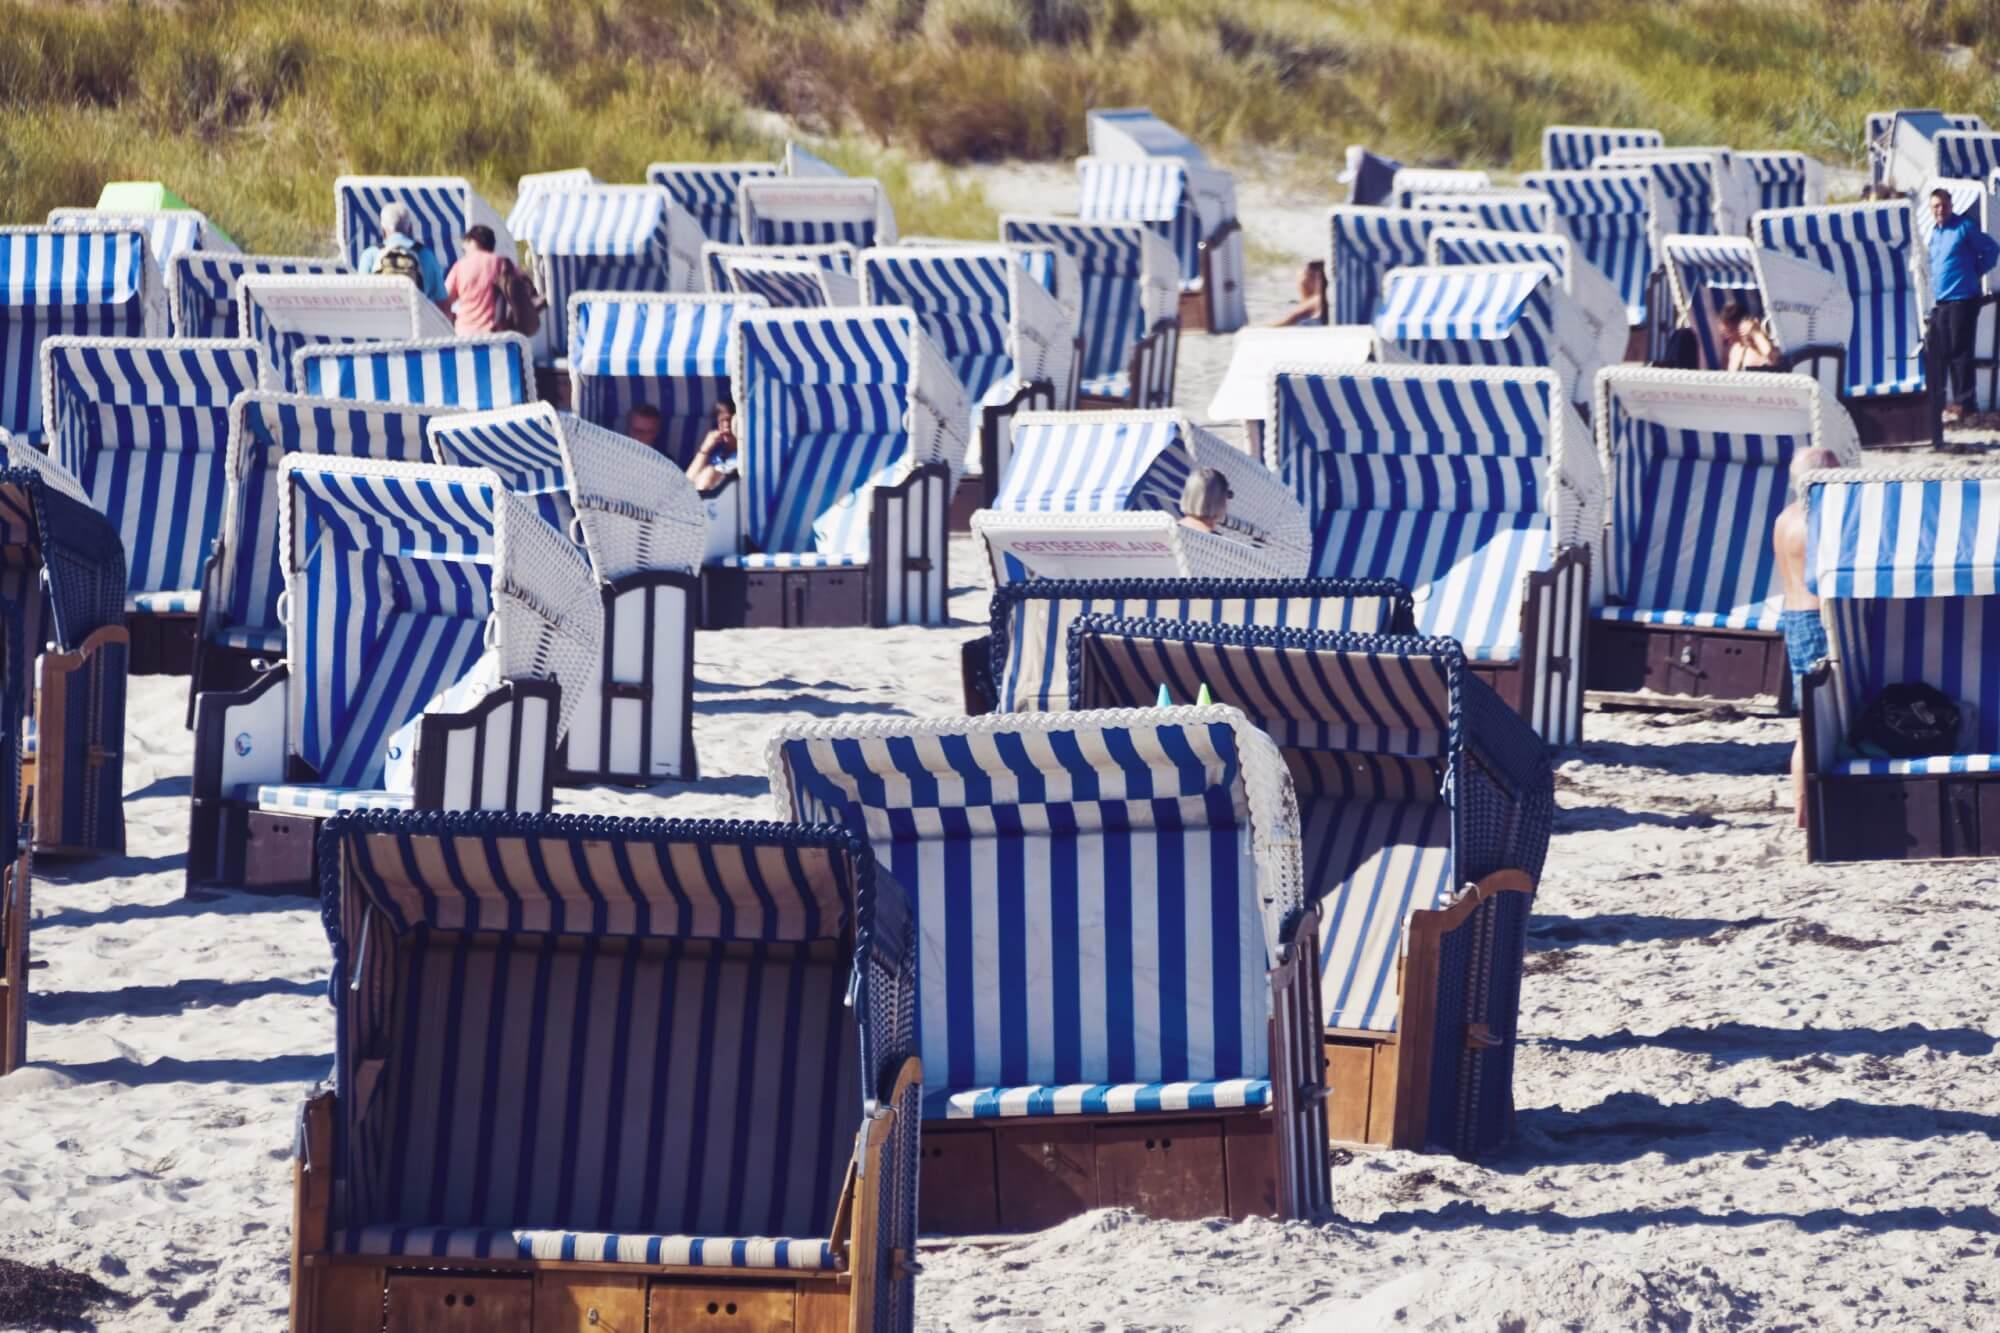 Ostseeurlaub Auf Dem Darß